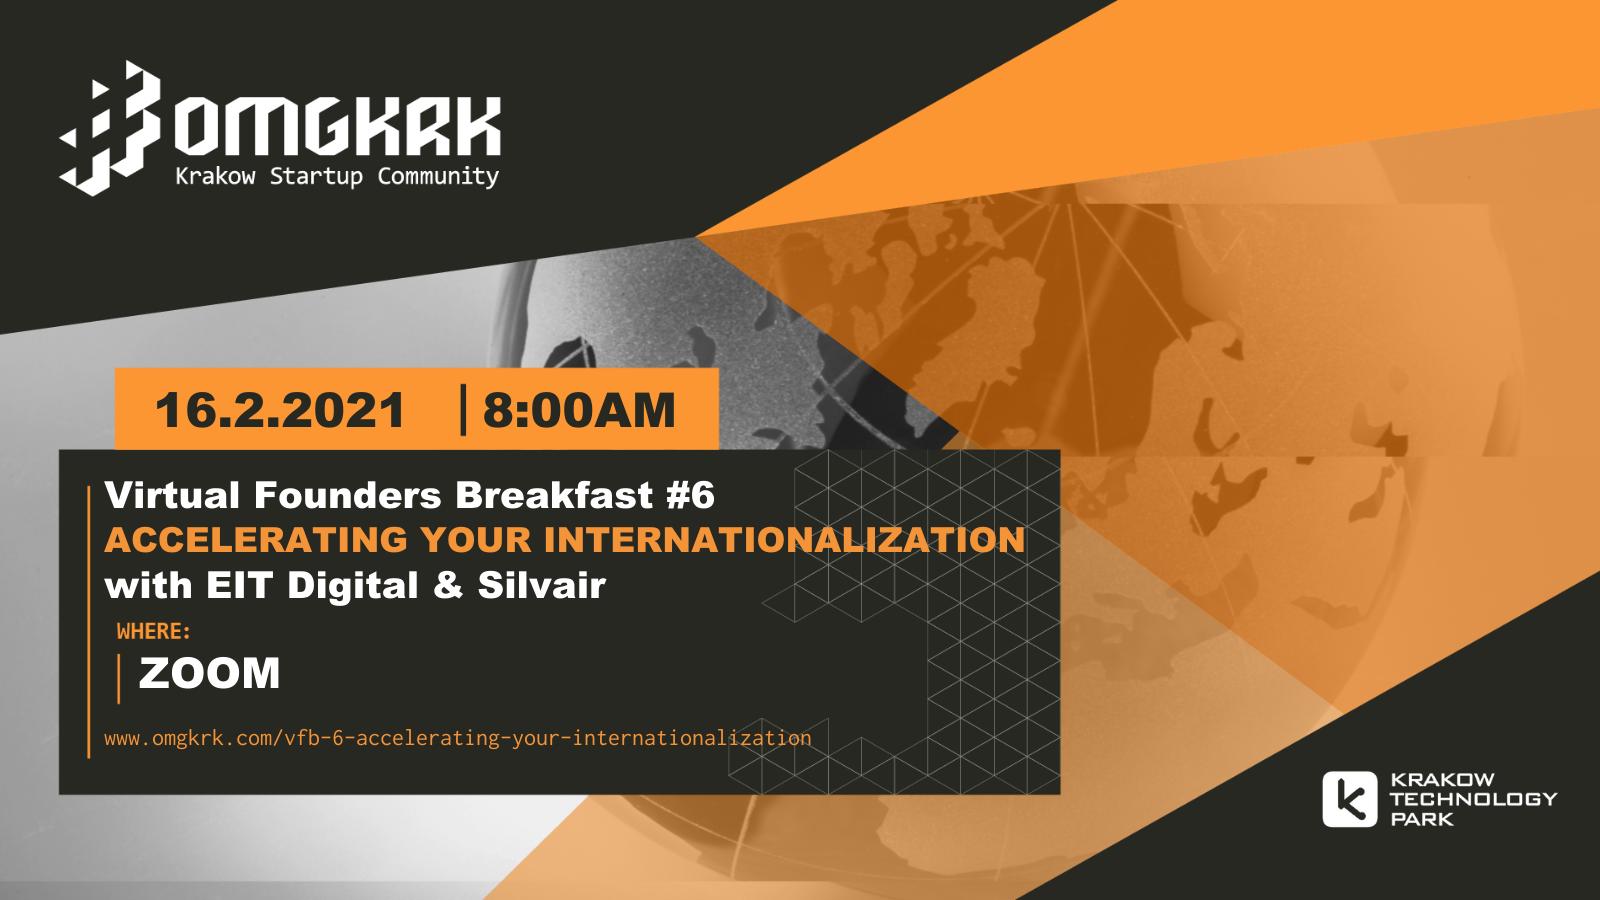 , Virtual Founders Breakfast #6: Accelerating Your Internationalization ft. EIT Digital & Silvair